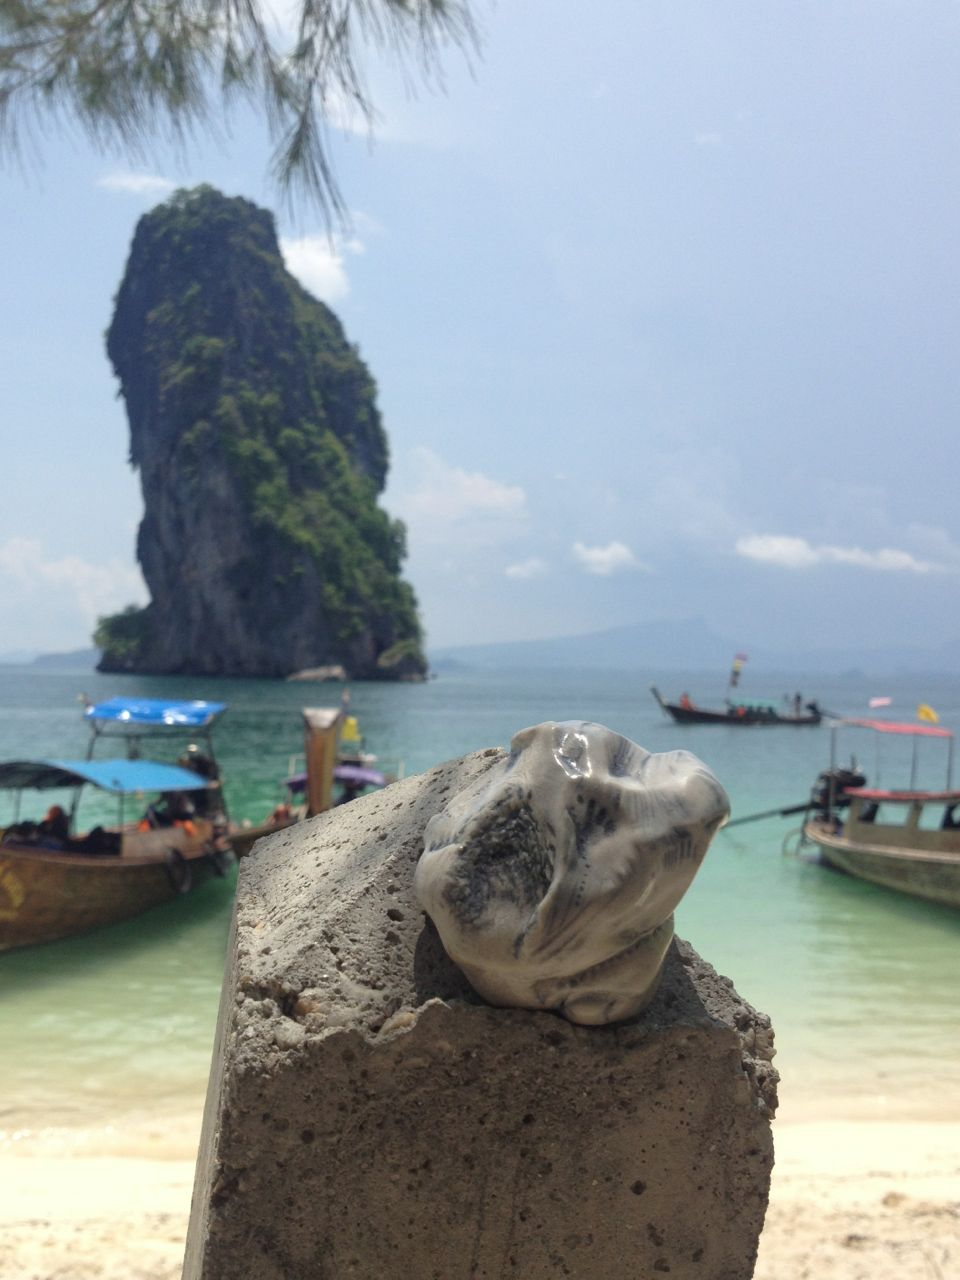 poda island . krabi . thailand 02.05.14